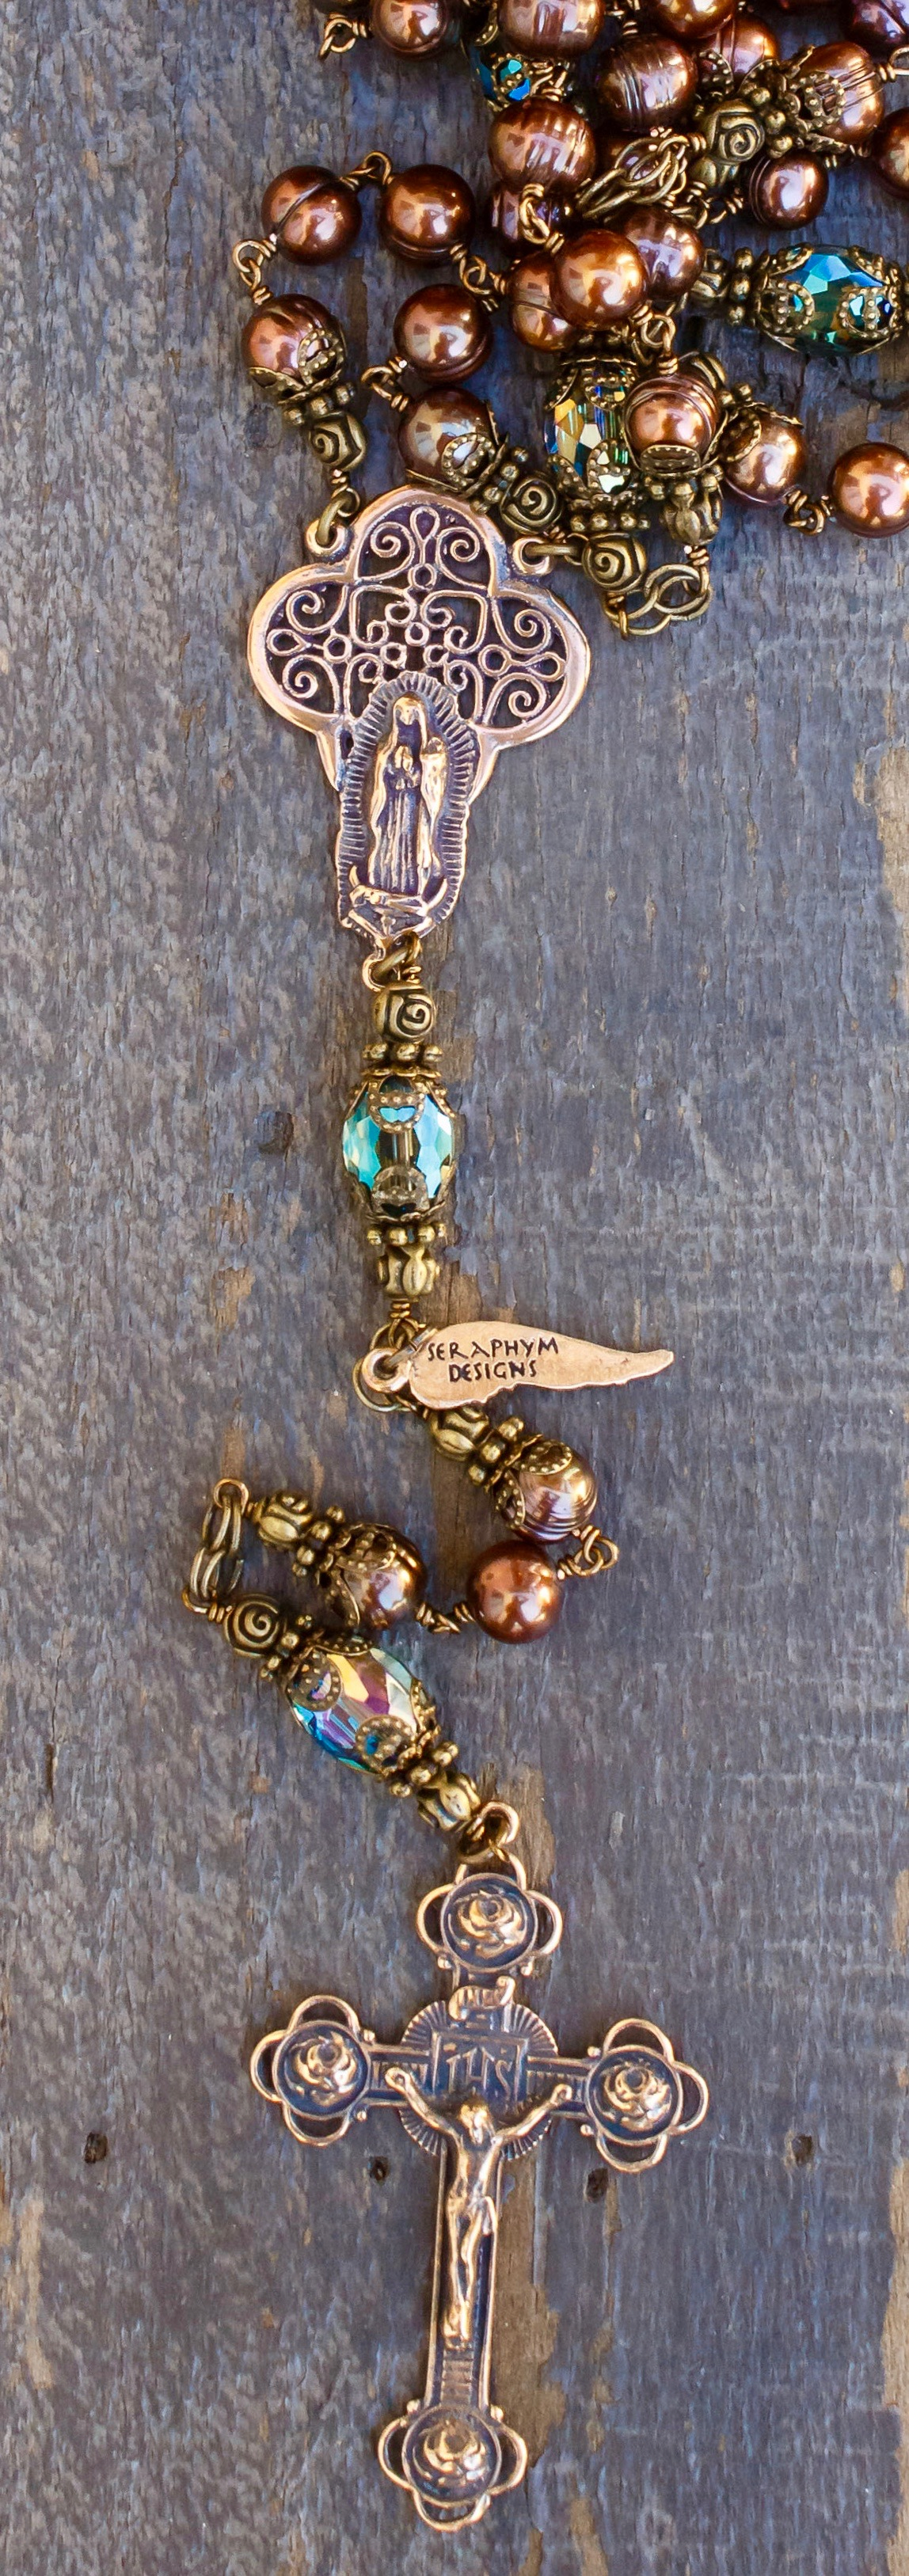 Silver Fresh Water Pearl Heirloom Rosary 8mm